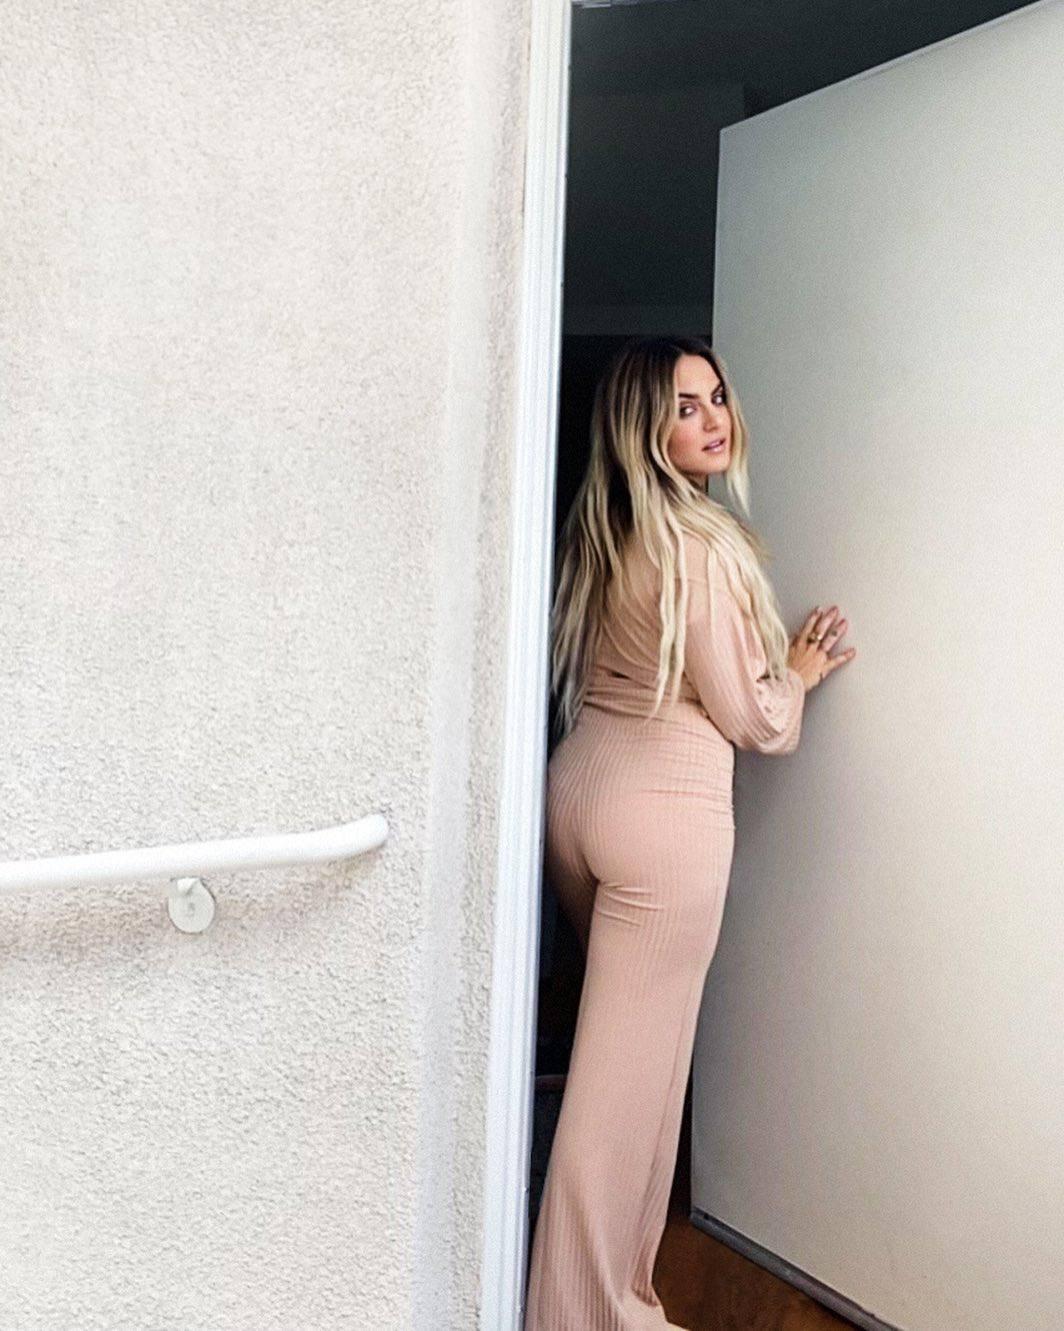 Jojo Sexy Ass In Tight Pants